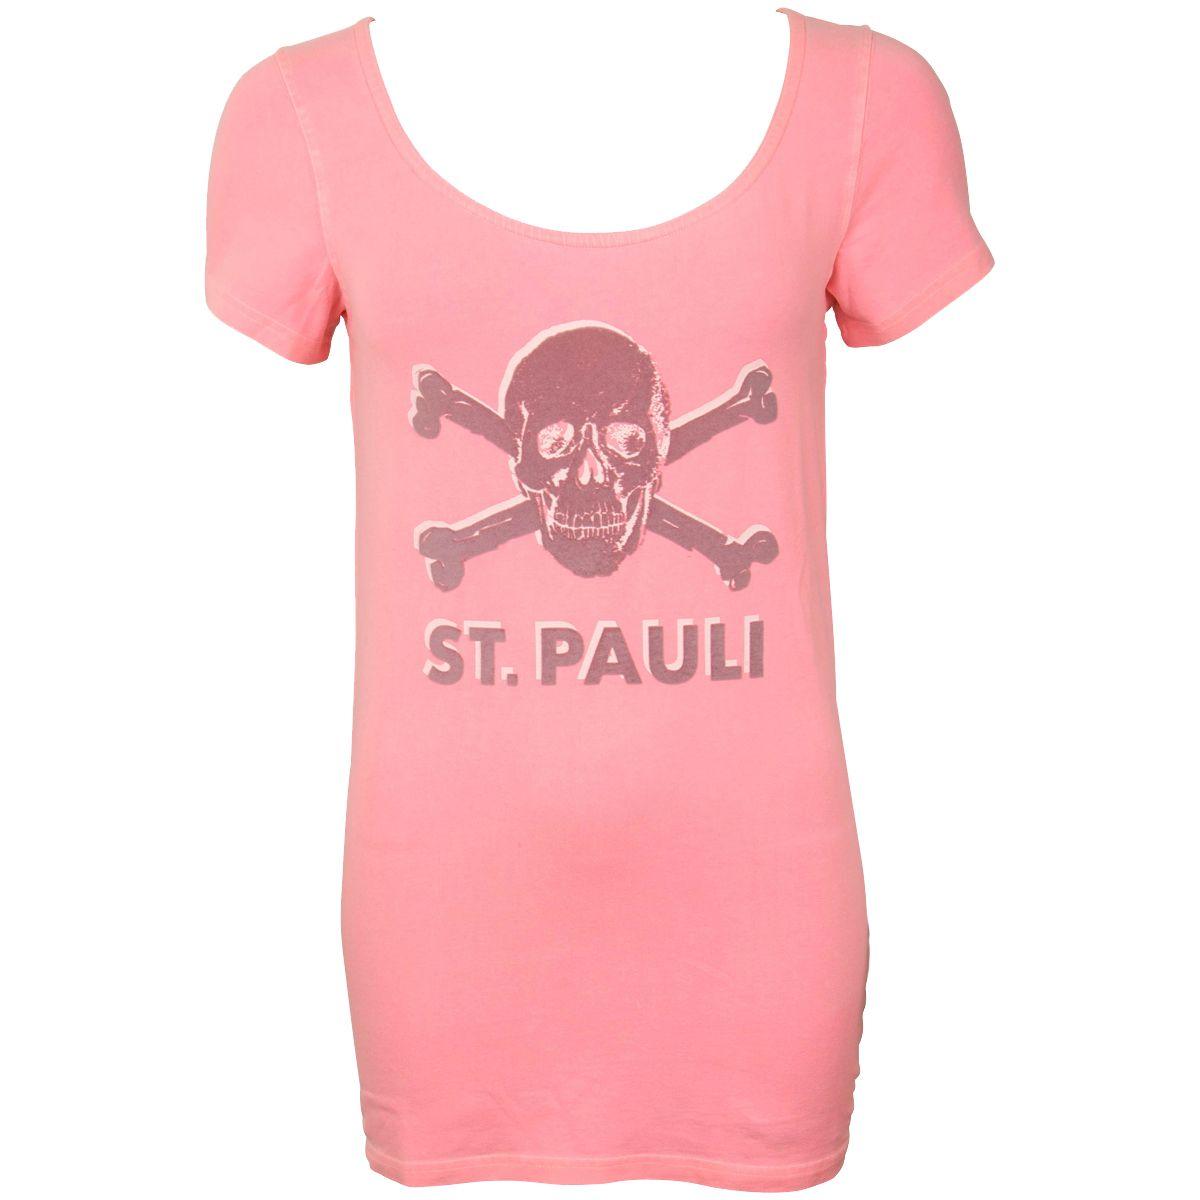 FC St. Pauli - Damen T-Shirt Ruby Totenkopf - pink